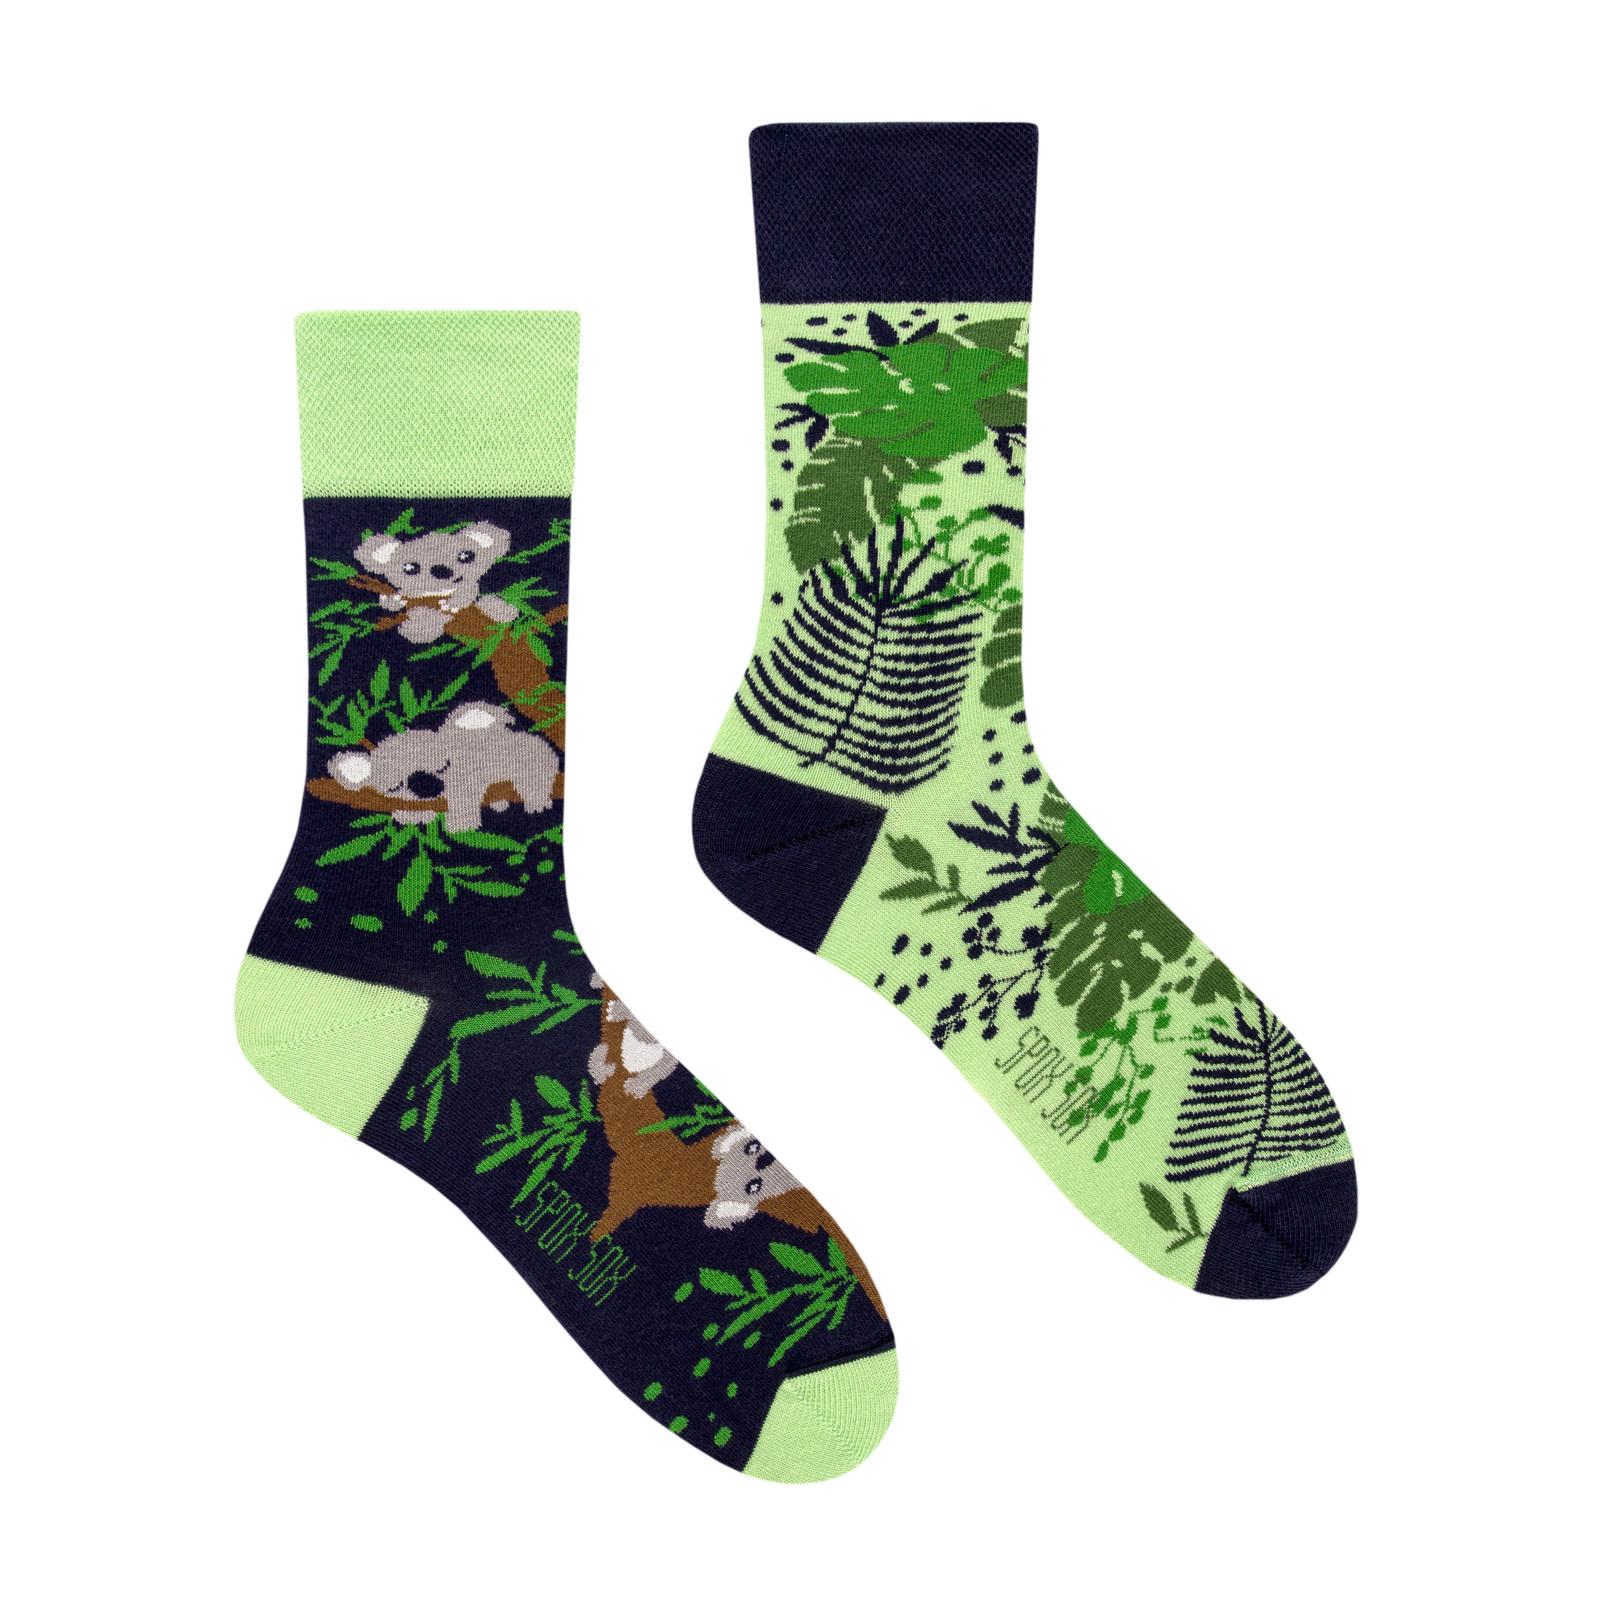 King Stone Socks Koala